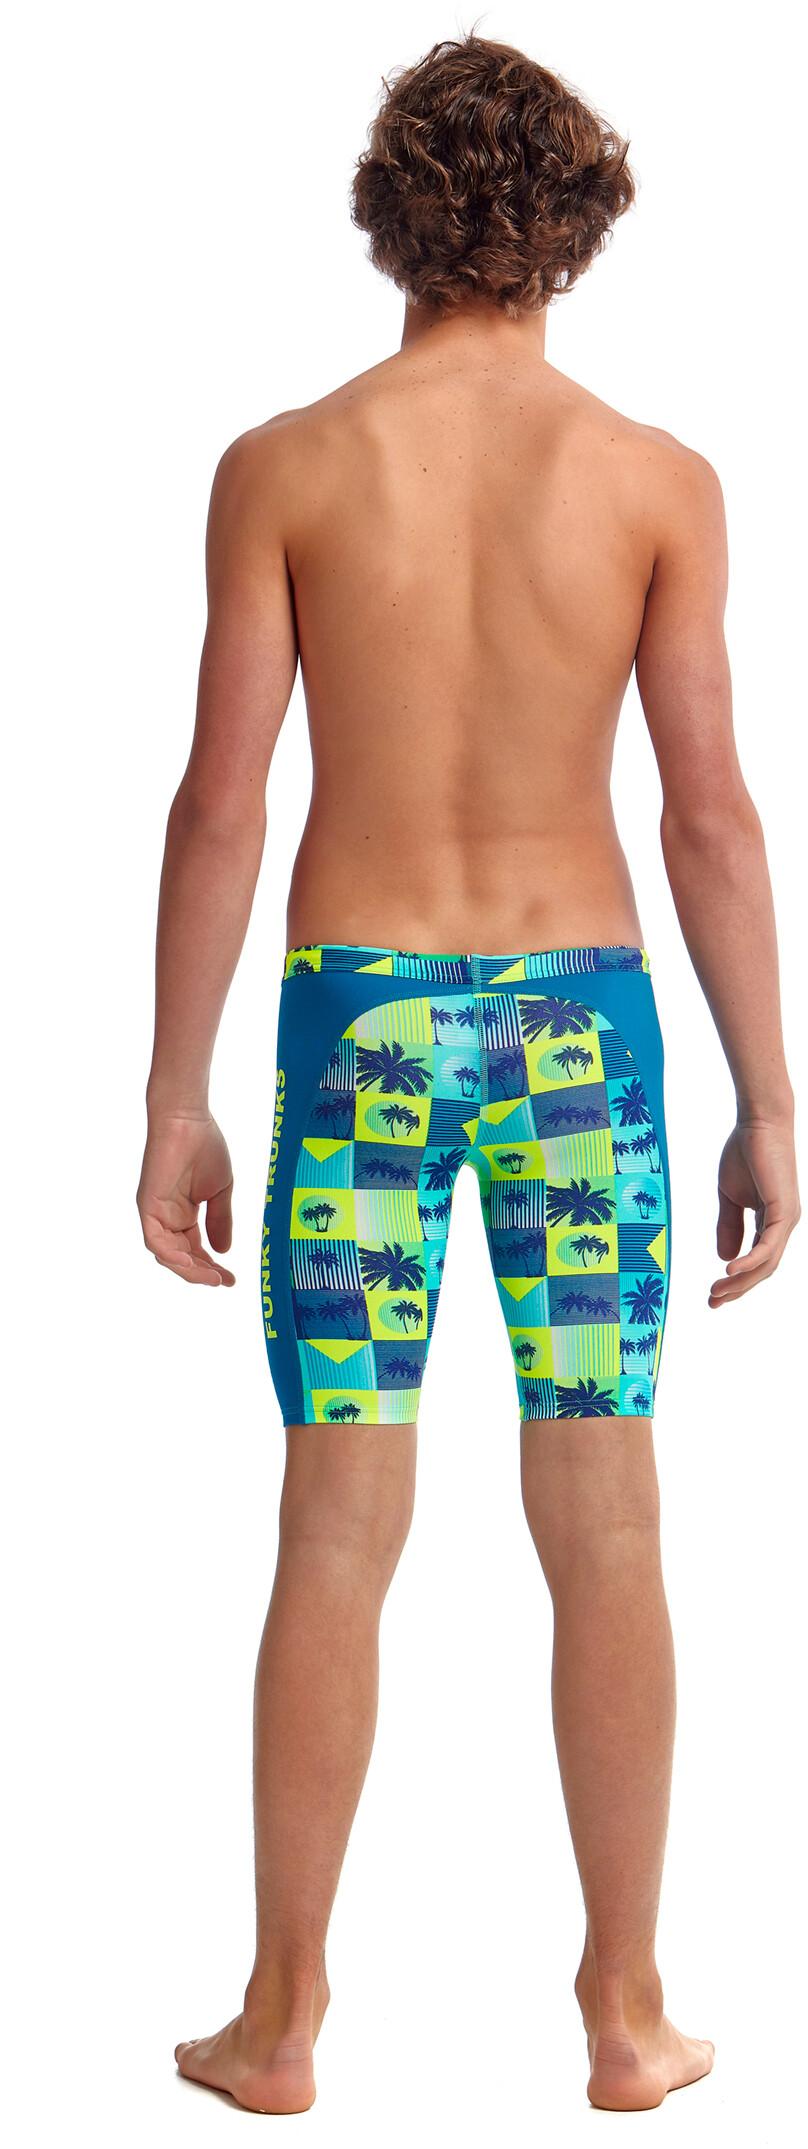 Funky Trunks Boys Pop Tropo Training Jammer Swimwear Boys Swimsuit